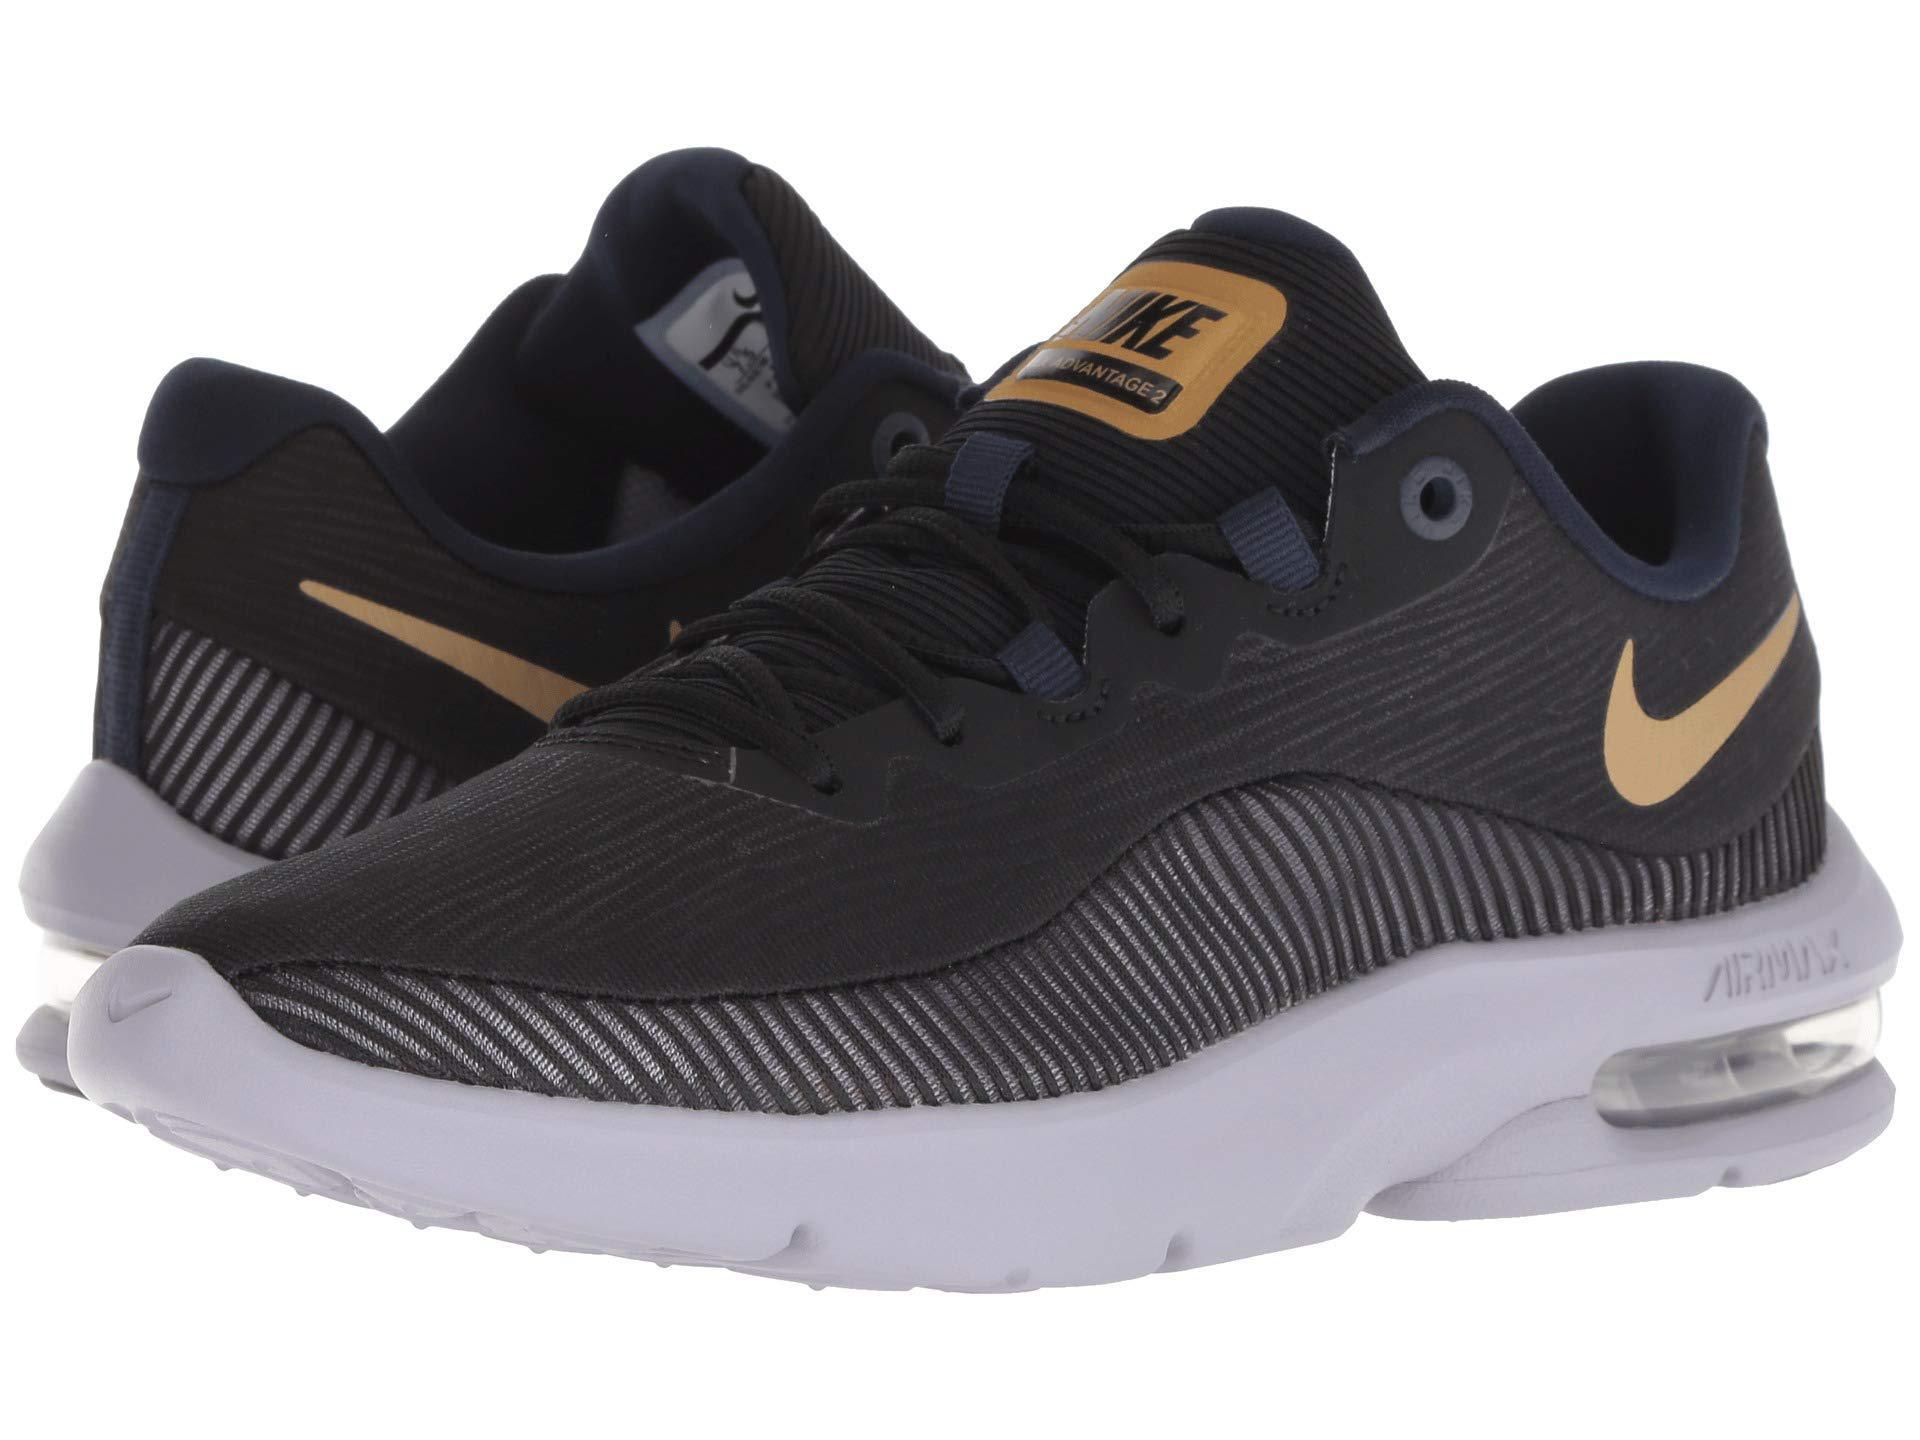 9a2918362037 Lyst - Nike Air Max Advantage 2 (white black) Women s Running Shoes ...